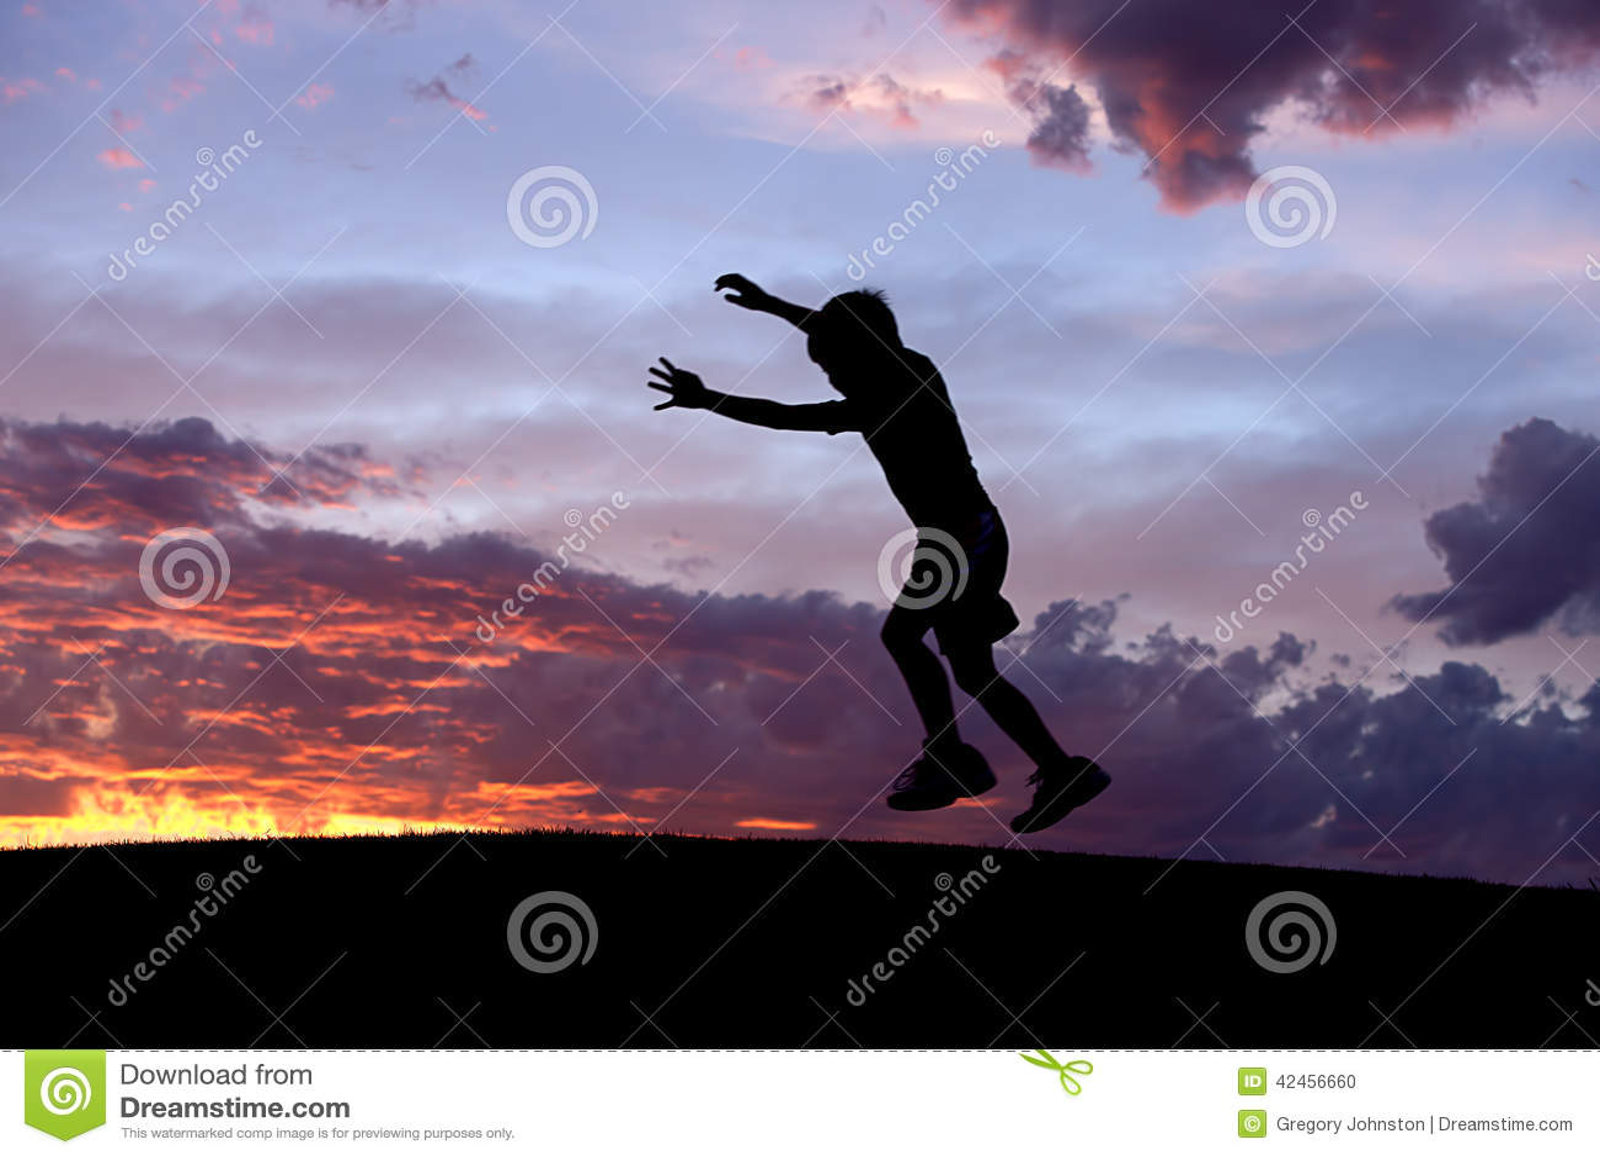 Junge springt bei Sonnenuntergang